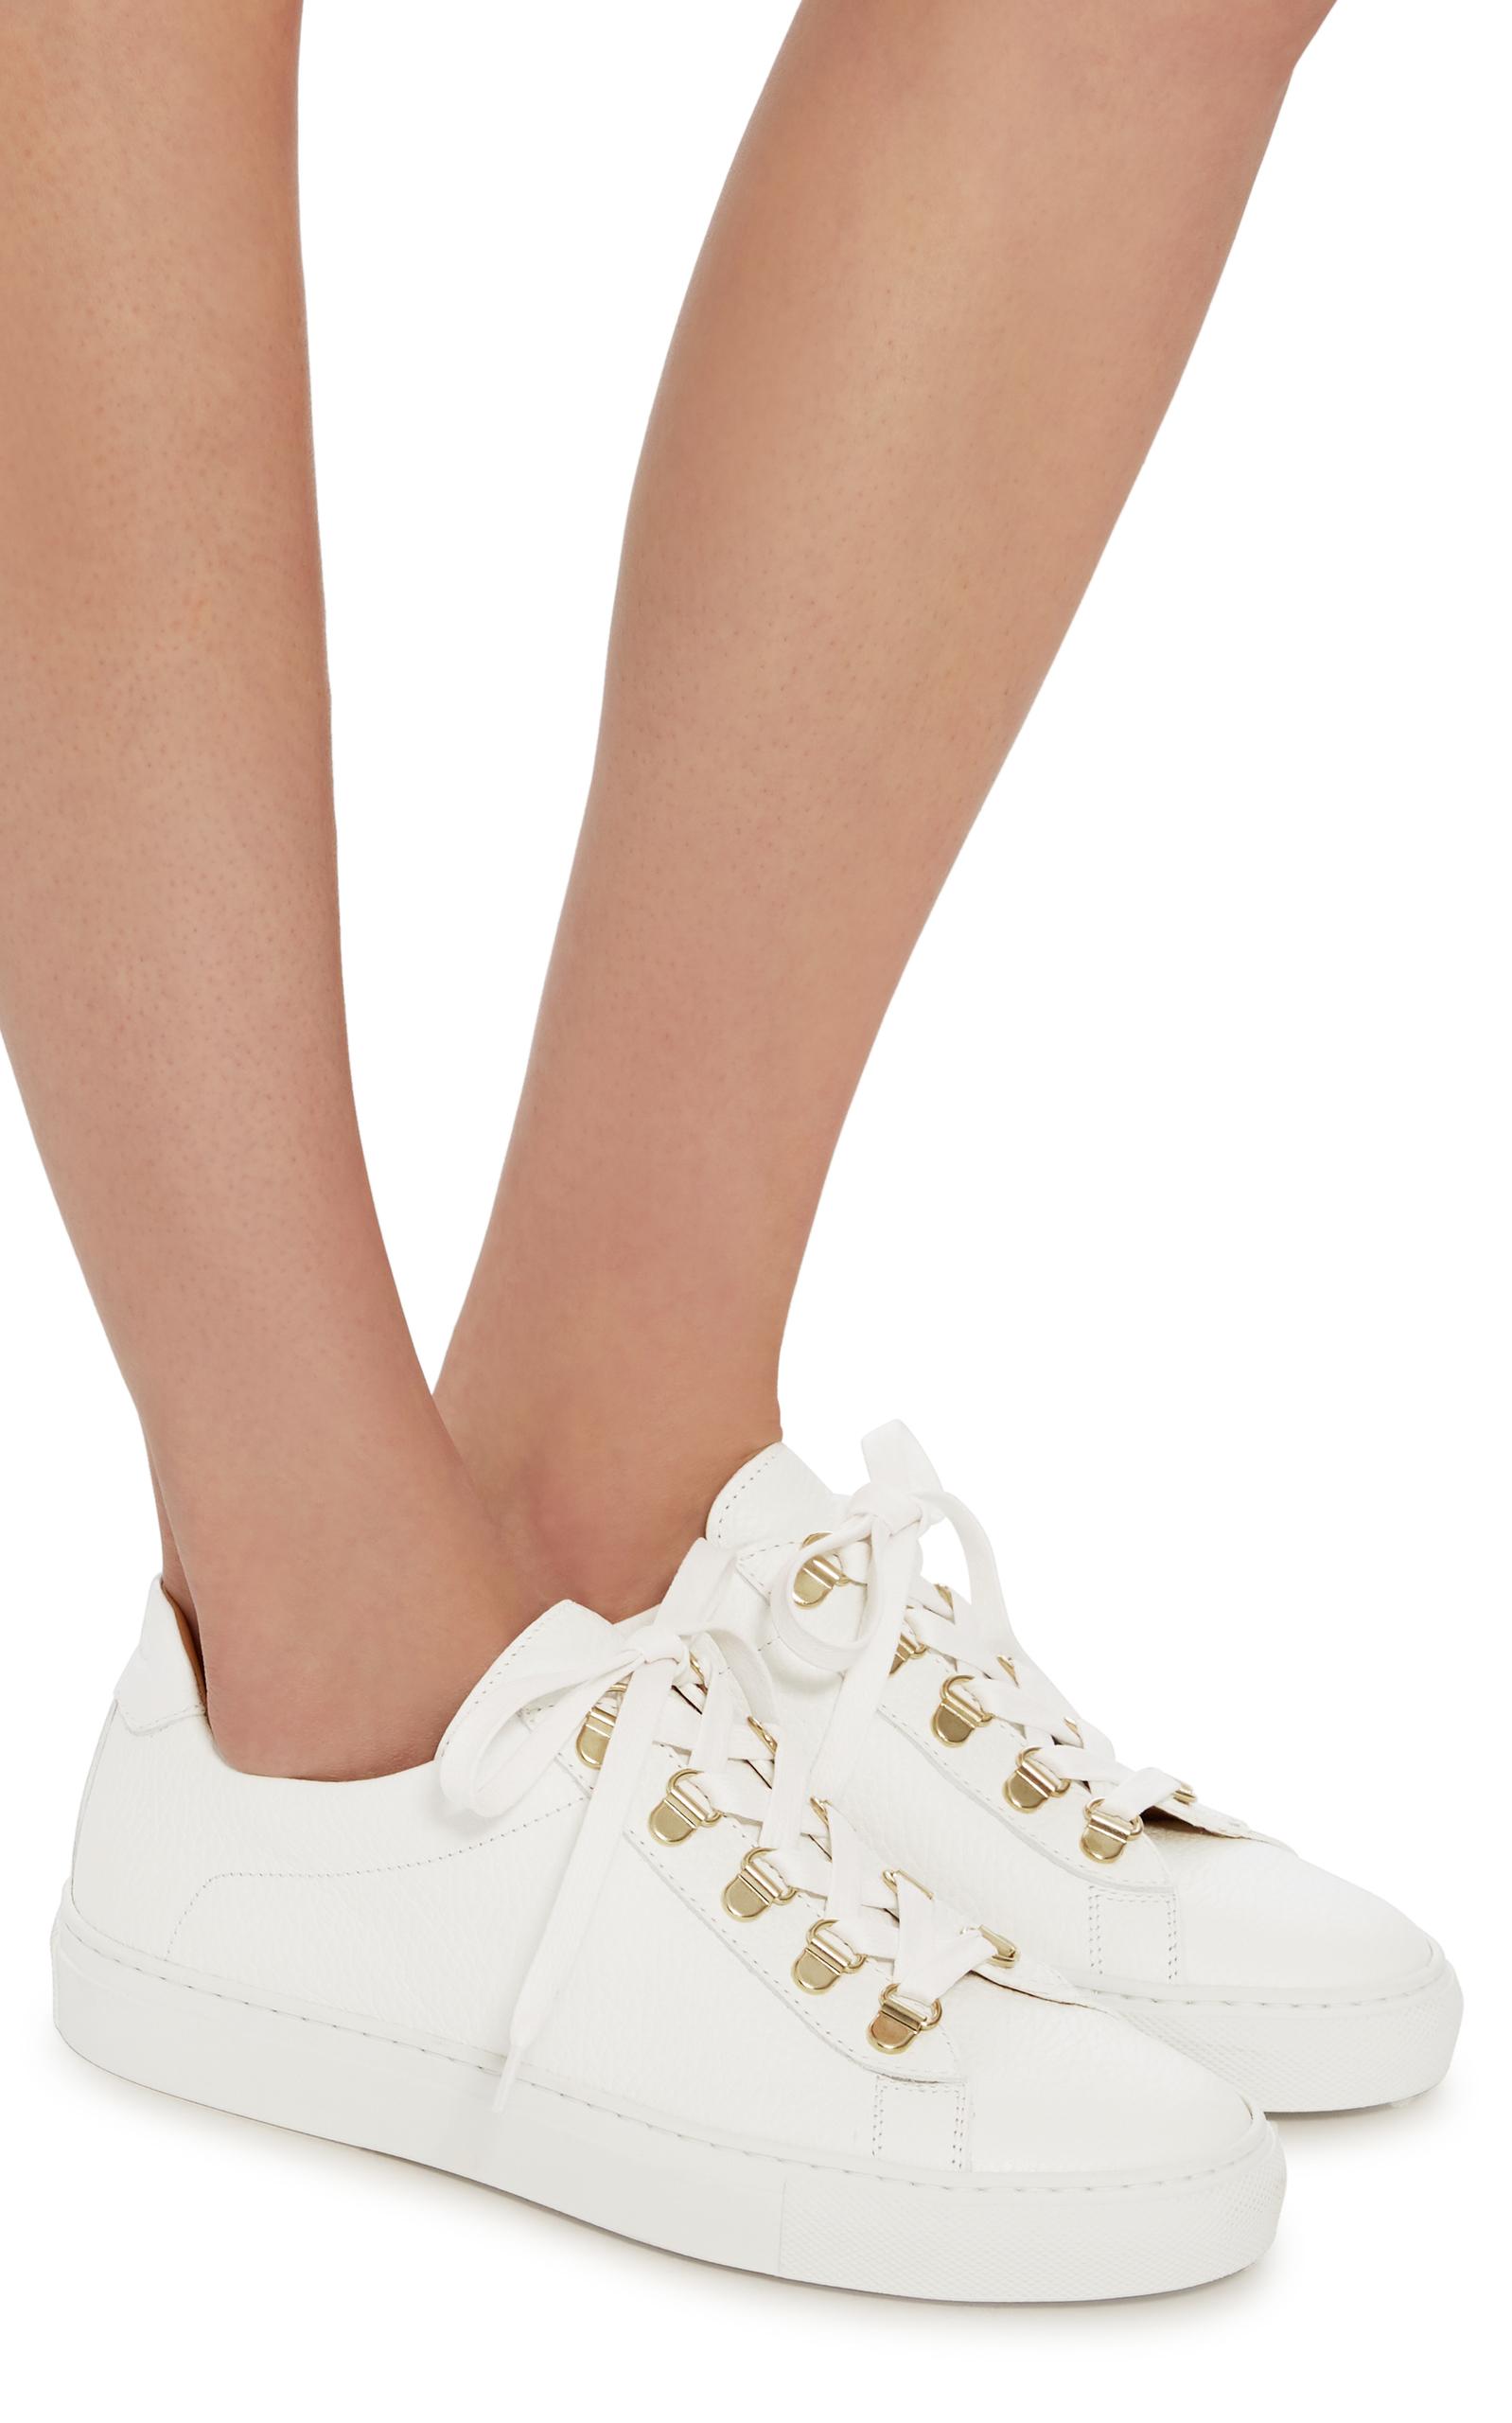 Koio Gavia Bianco Sneaker uNFucyhXUb